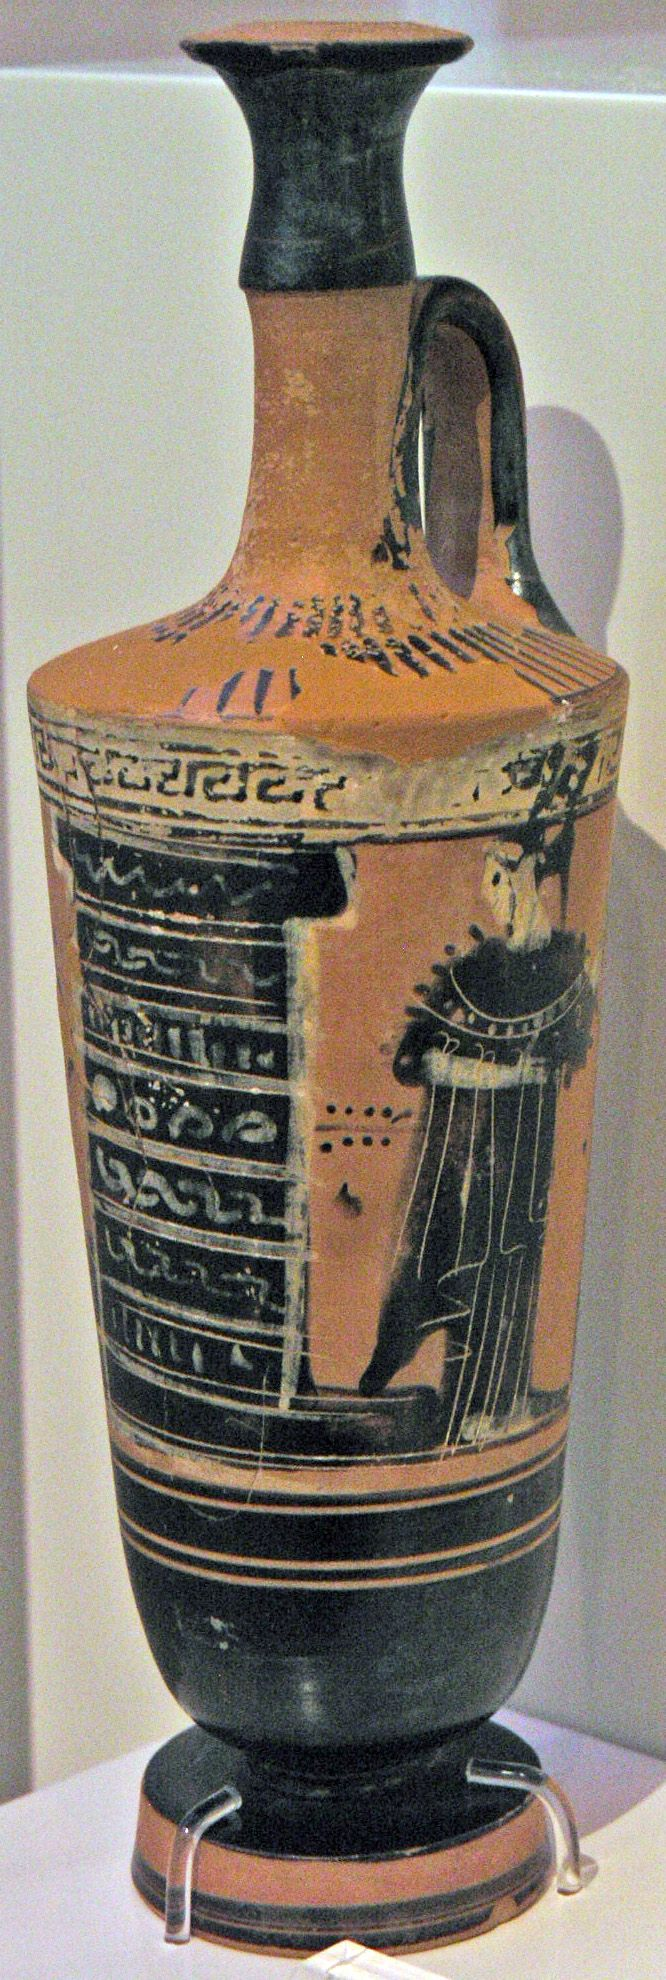 194 best ancient greek vases194 images on pinterest 194 best ancient greek vases194 images on pinterest ancient greece greek pottery and black figure reviewsmspy